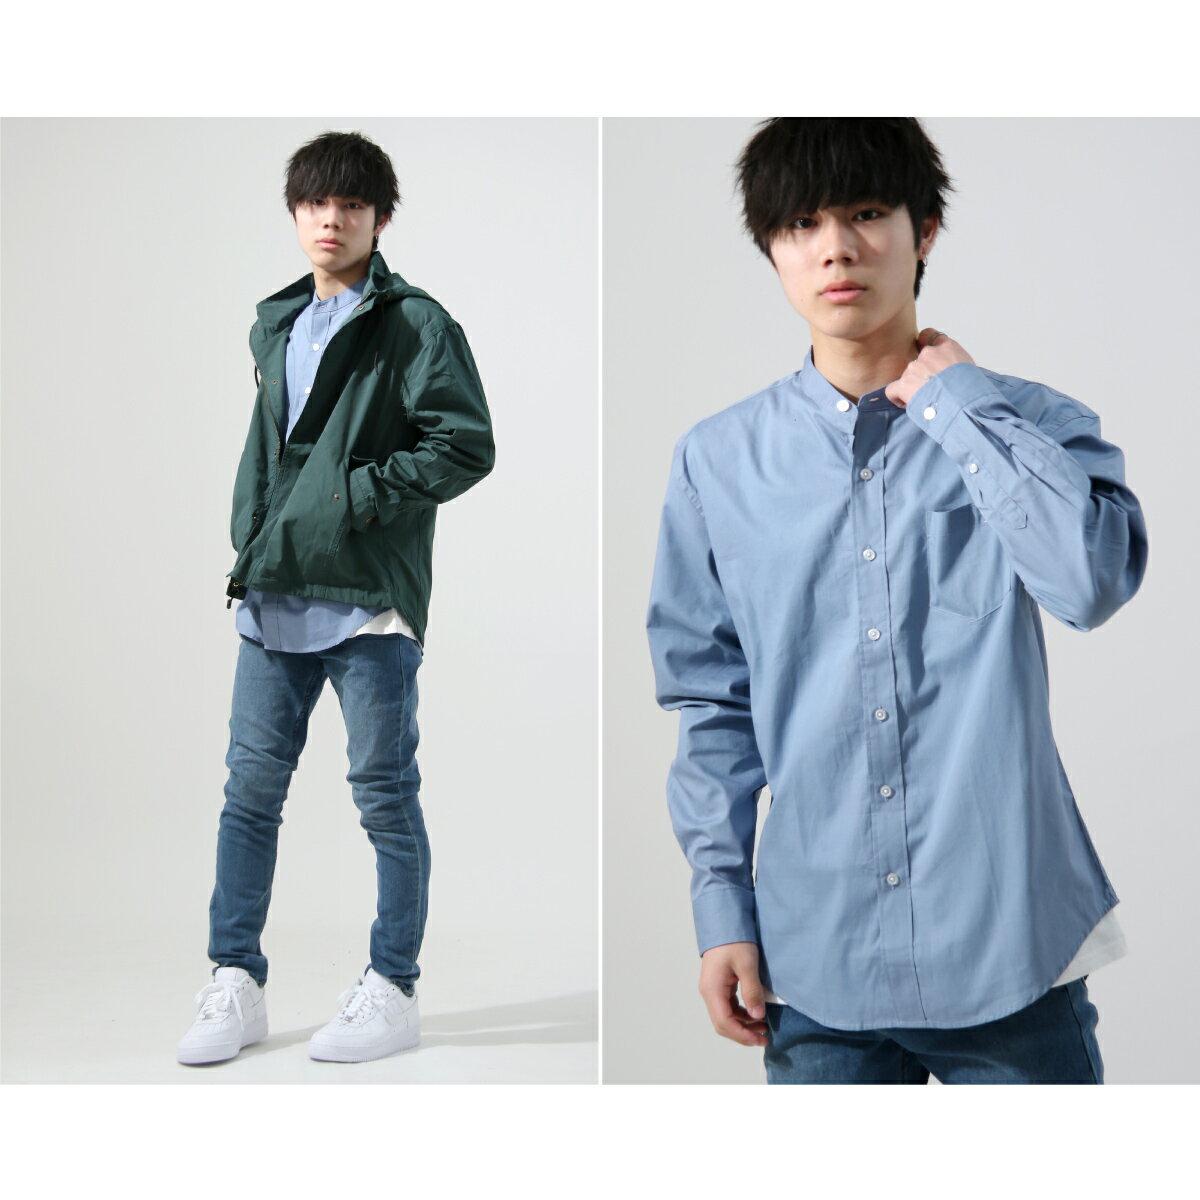 【New】KANGOL 立領襯衫 特注款 5